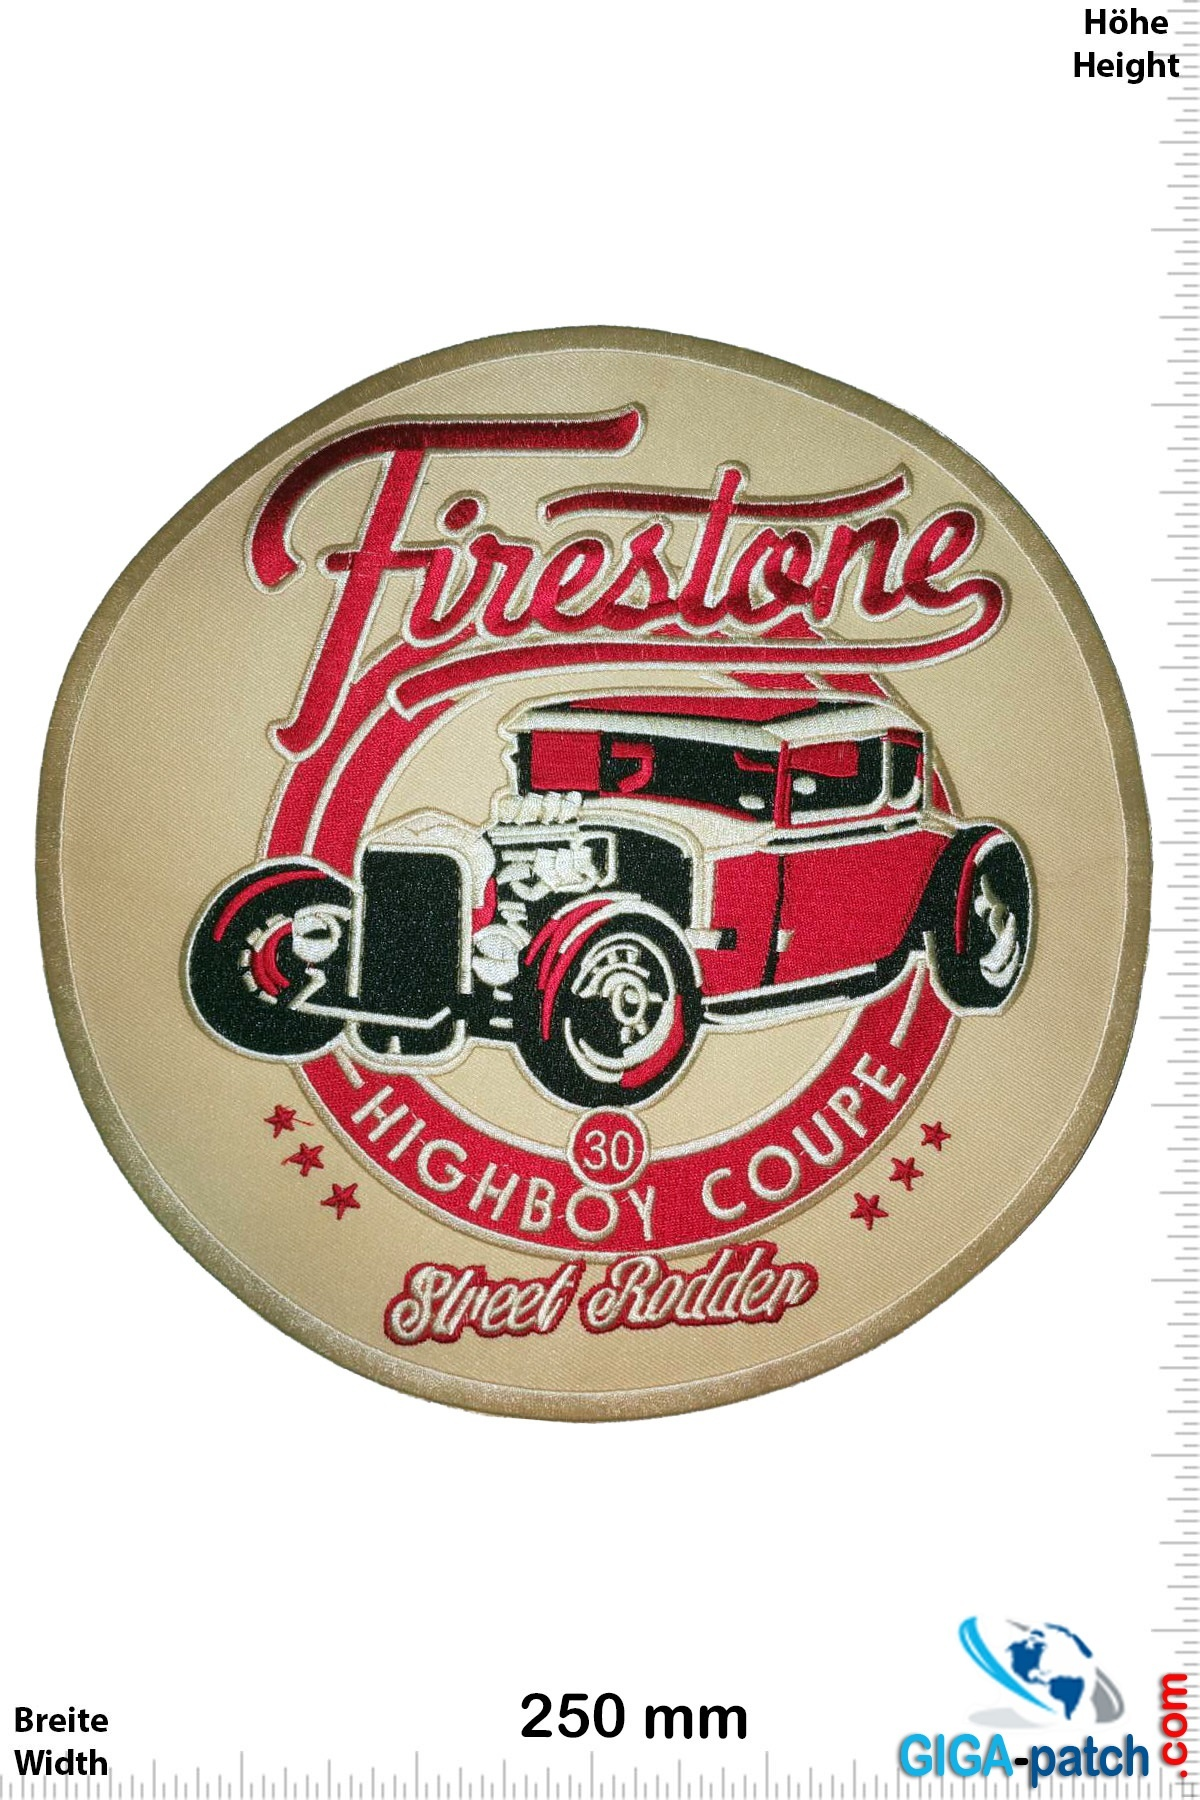 Firestone Firestone- Street Rodder - Highboy Coupe - 25 cm